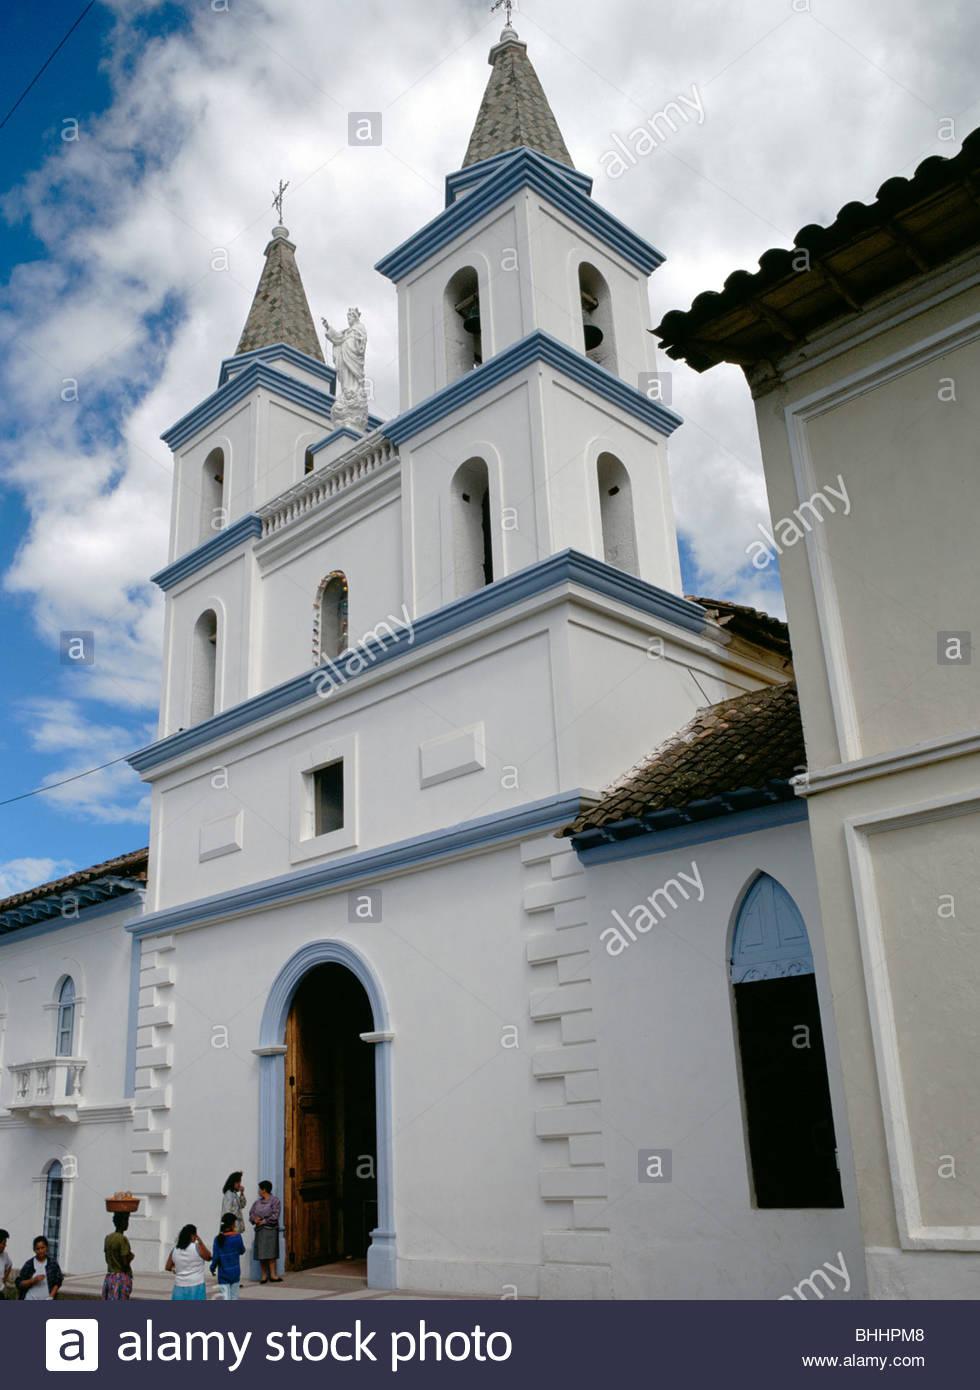 Catholic church of San Antonio de Ibarra, Ecuador. Artist: Dr Stephen Coyne - Stock Image